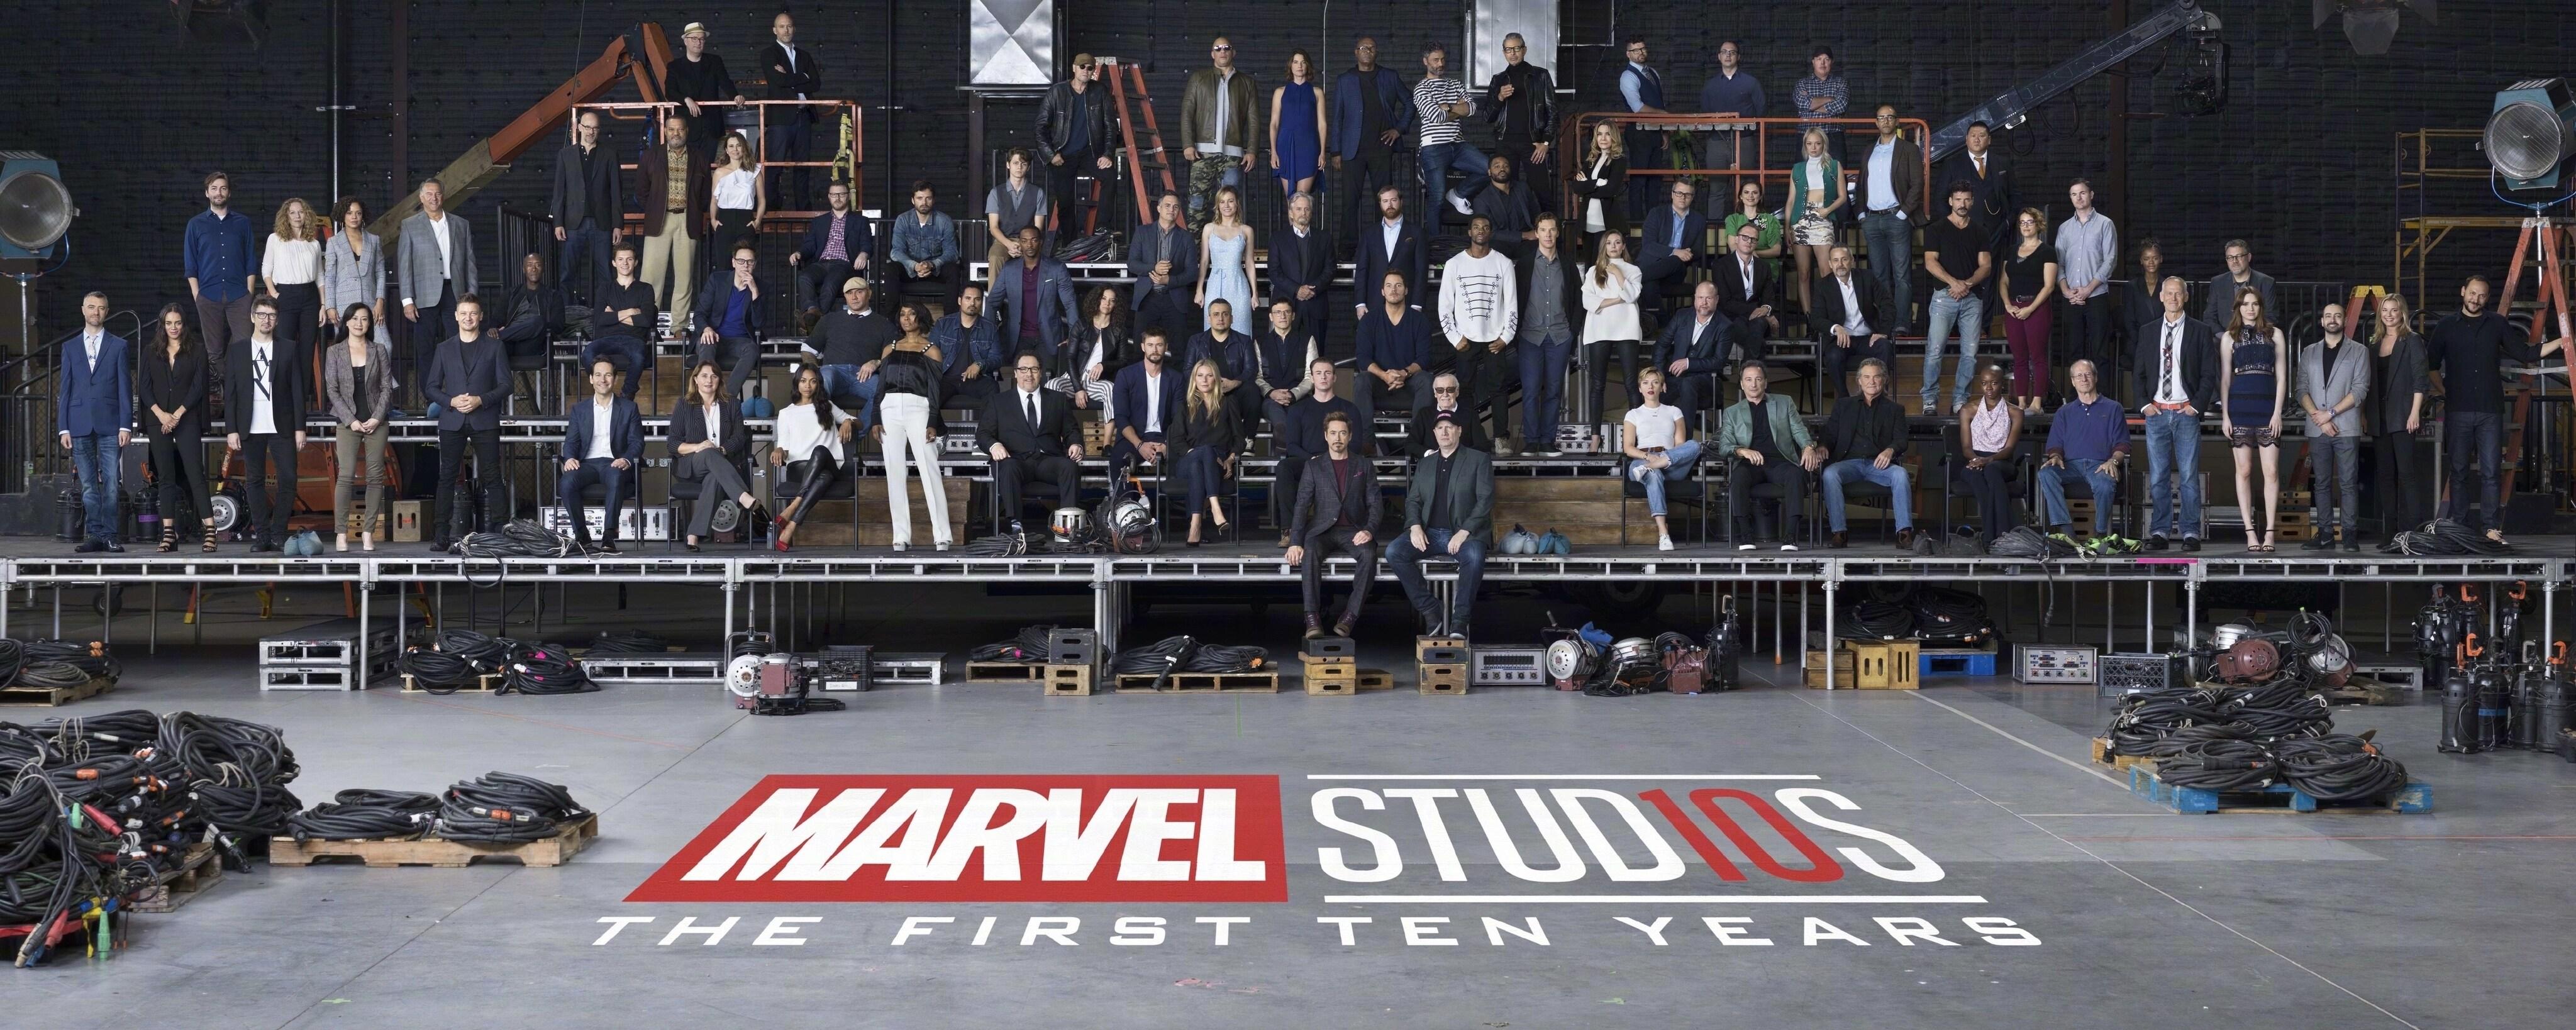 avengers infinity war cast photo